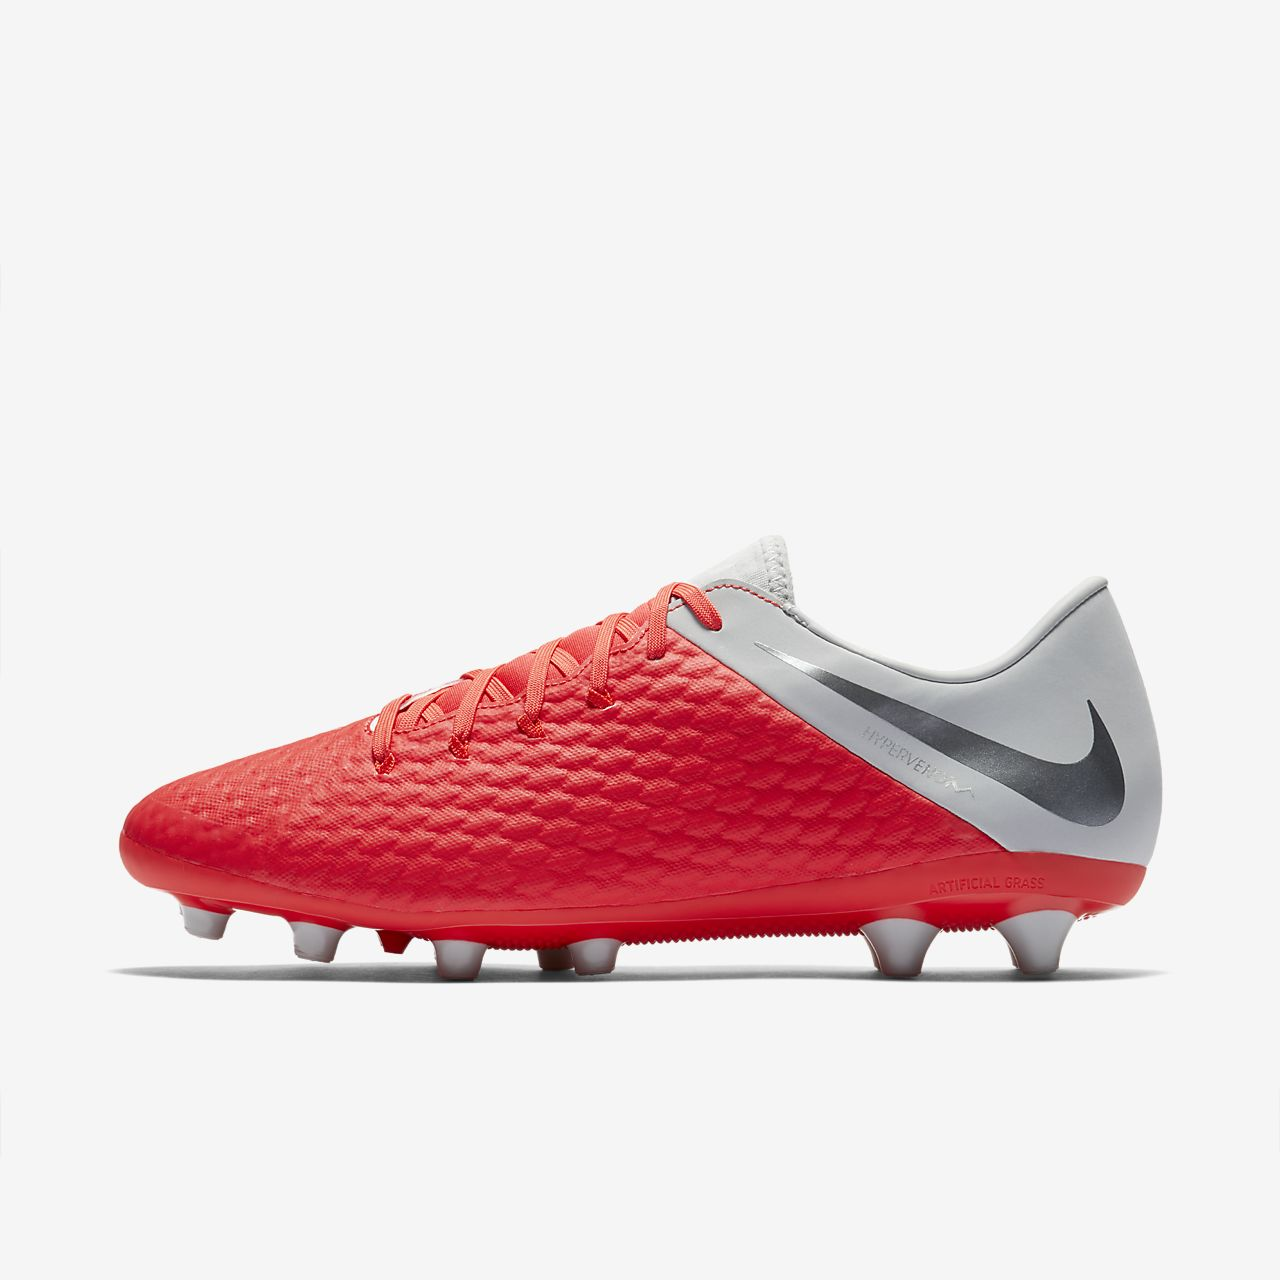 89dd1f187fb5 Nike Hypervenom III Academy AG-PRO Artificial-Grass Football Boot ...